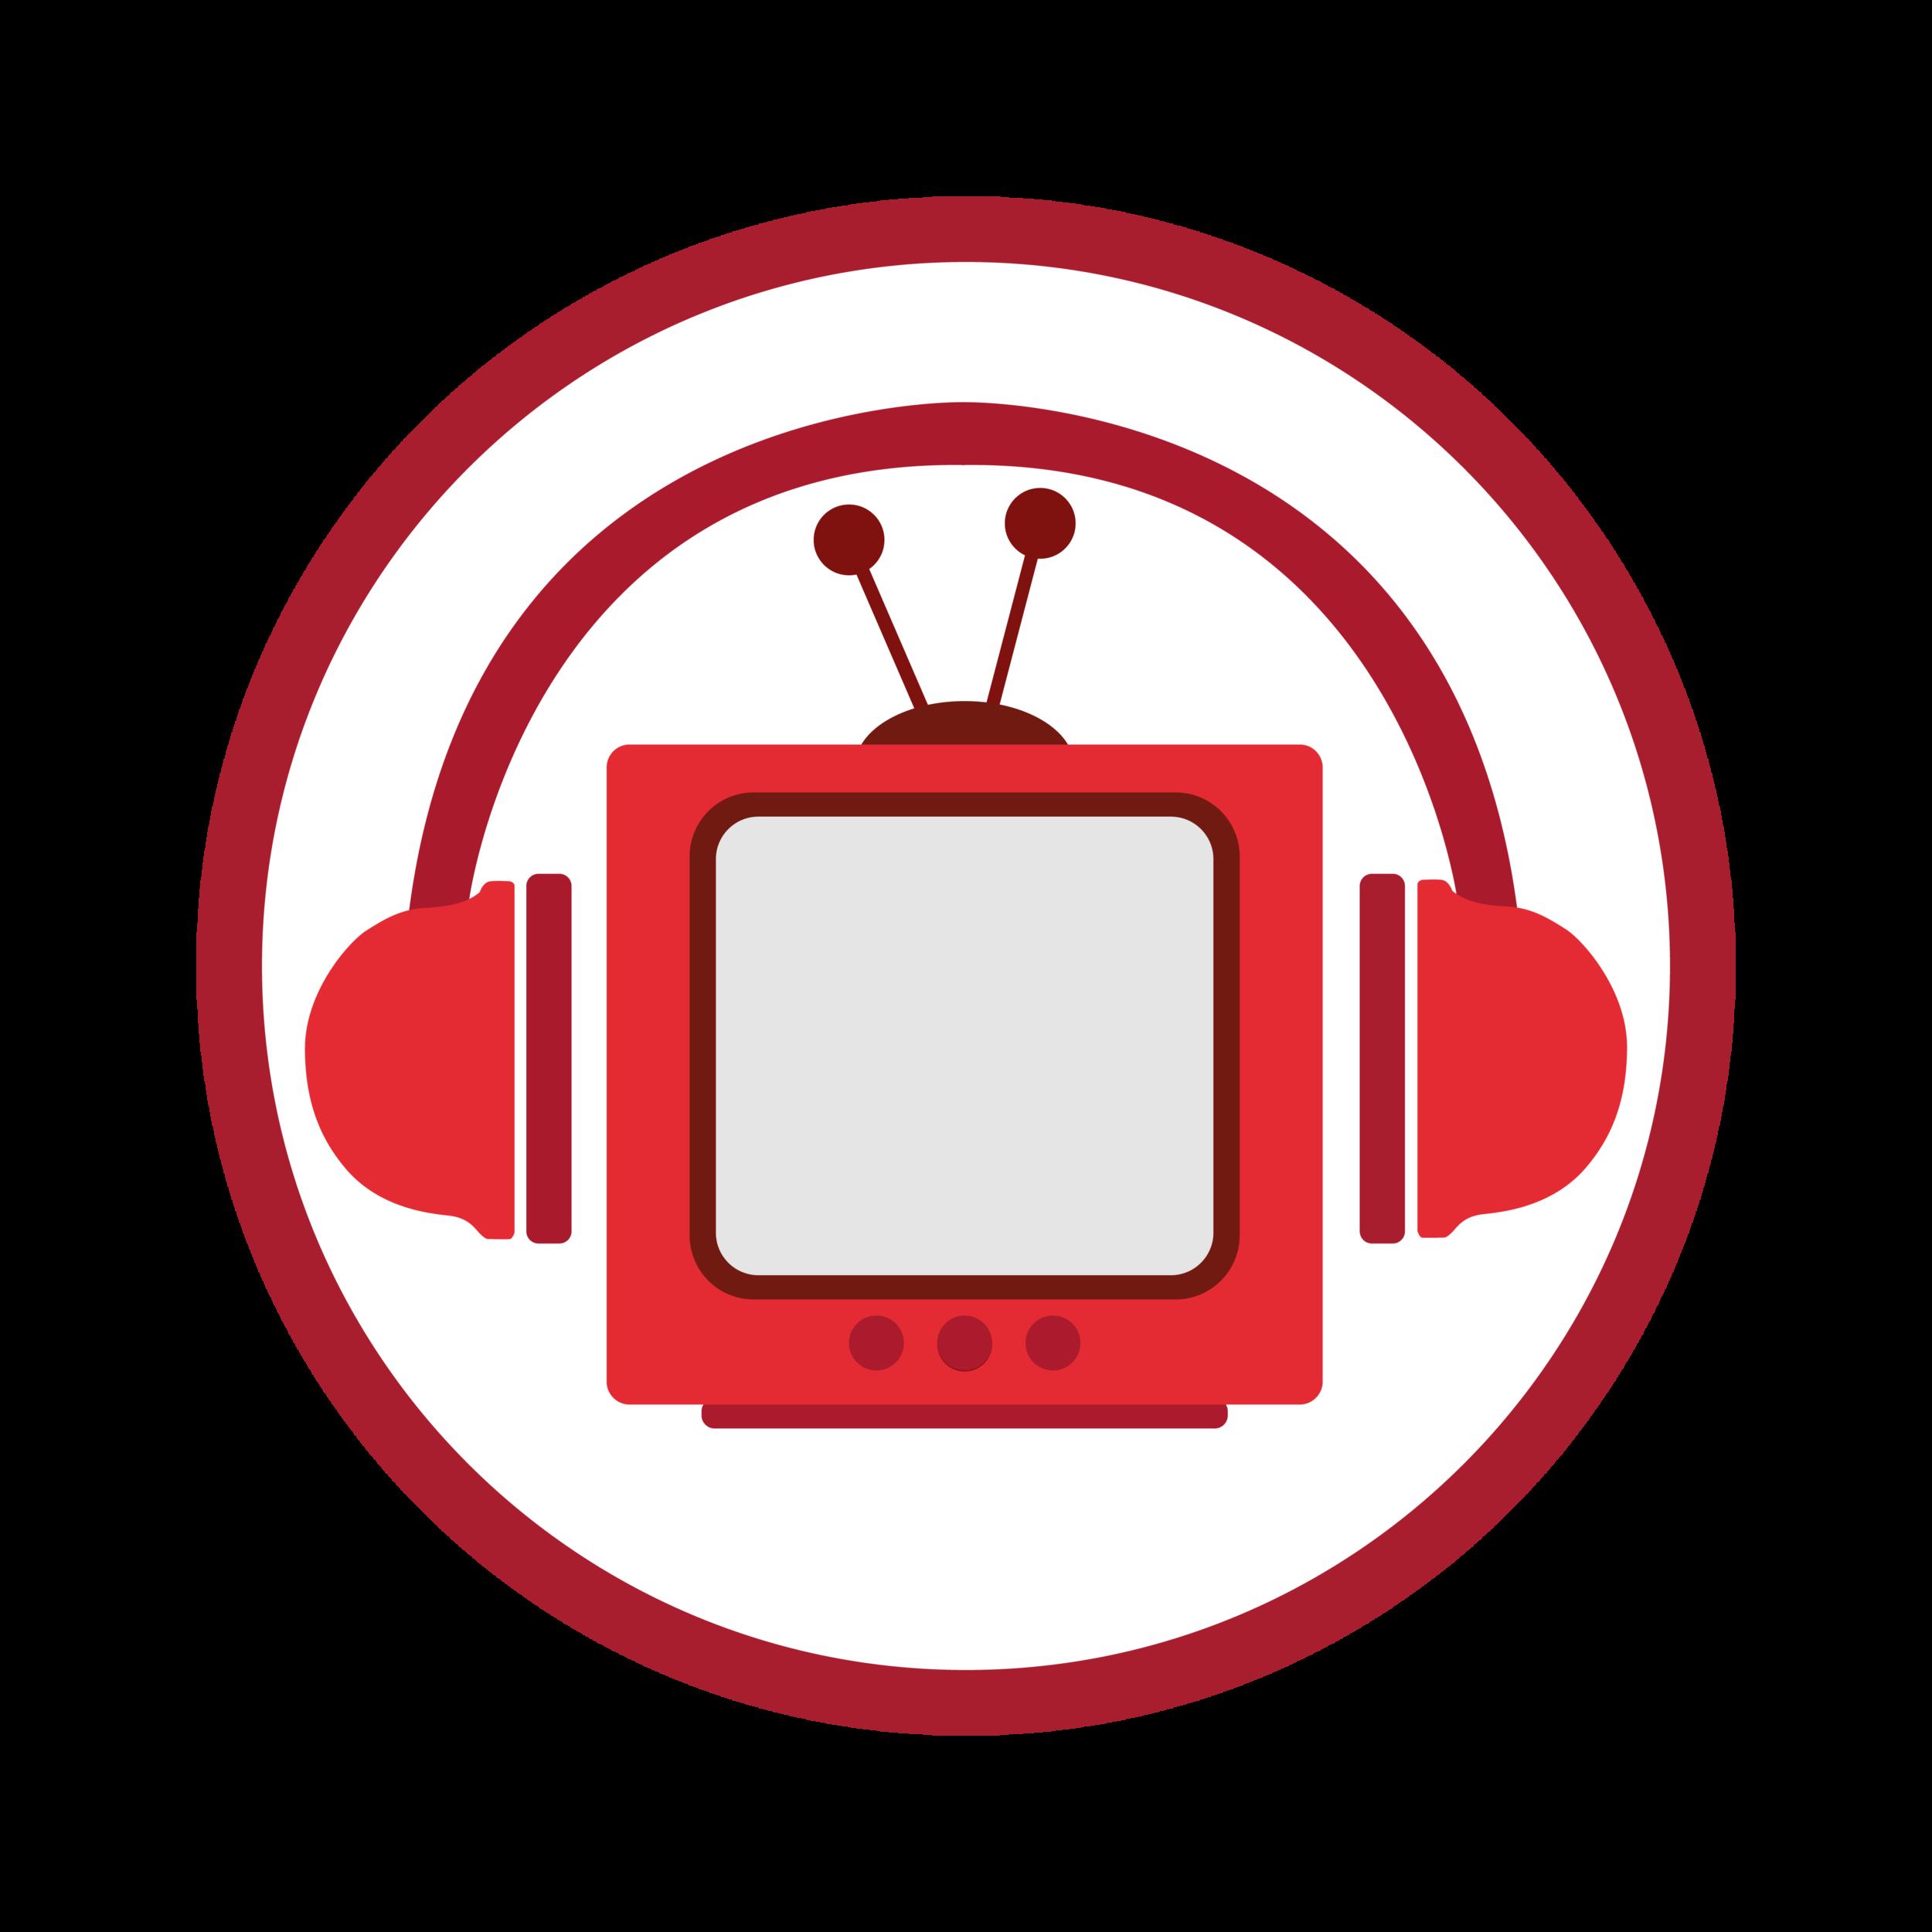 TV with headphones